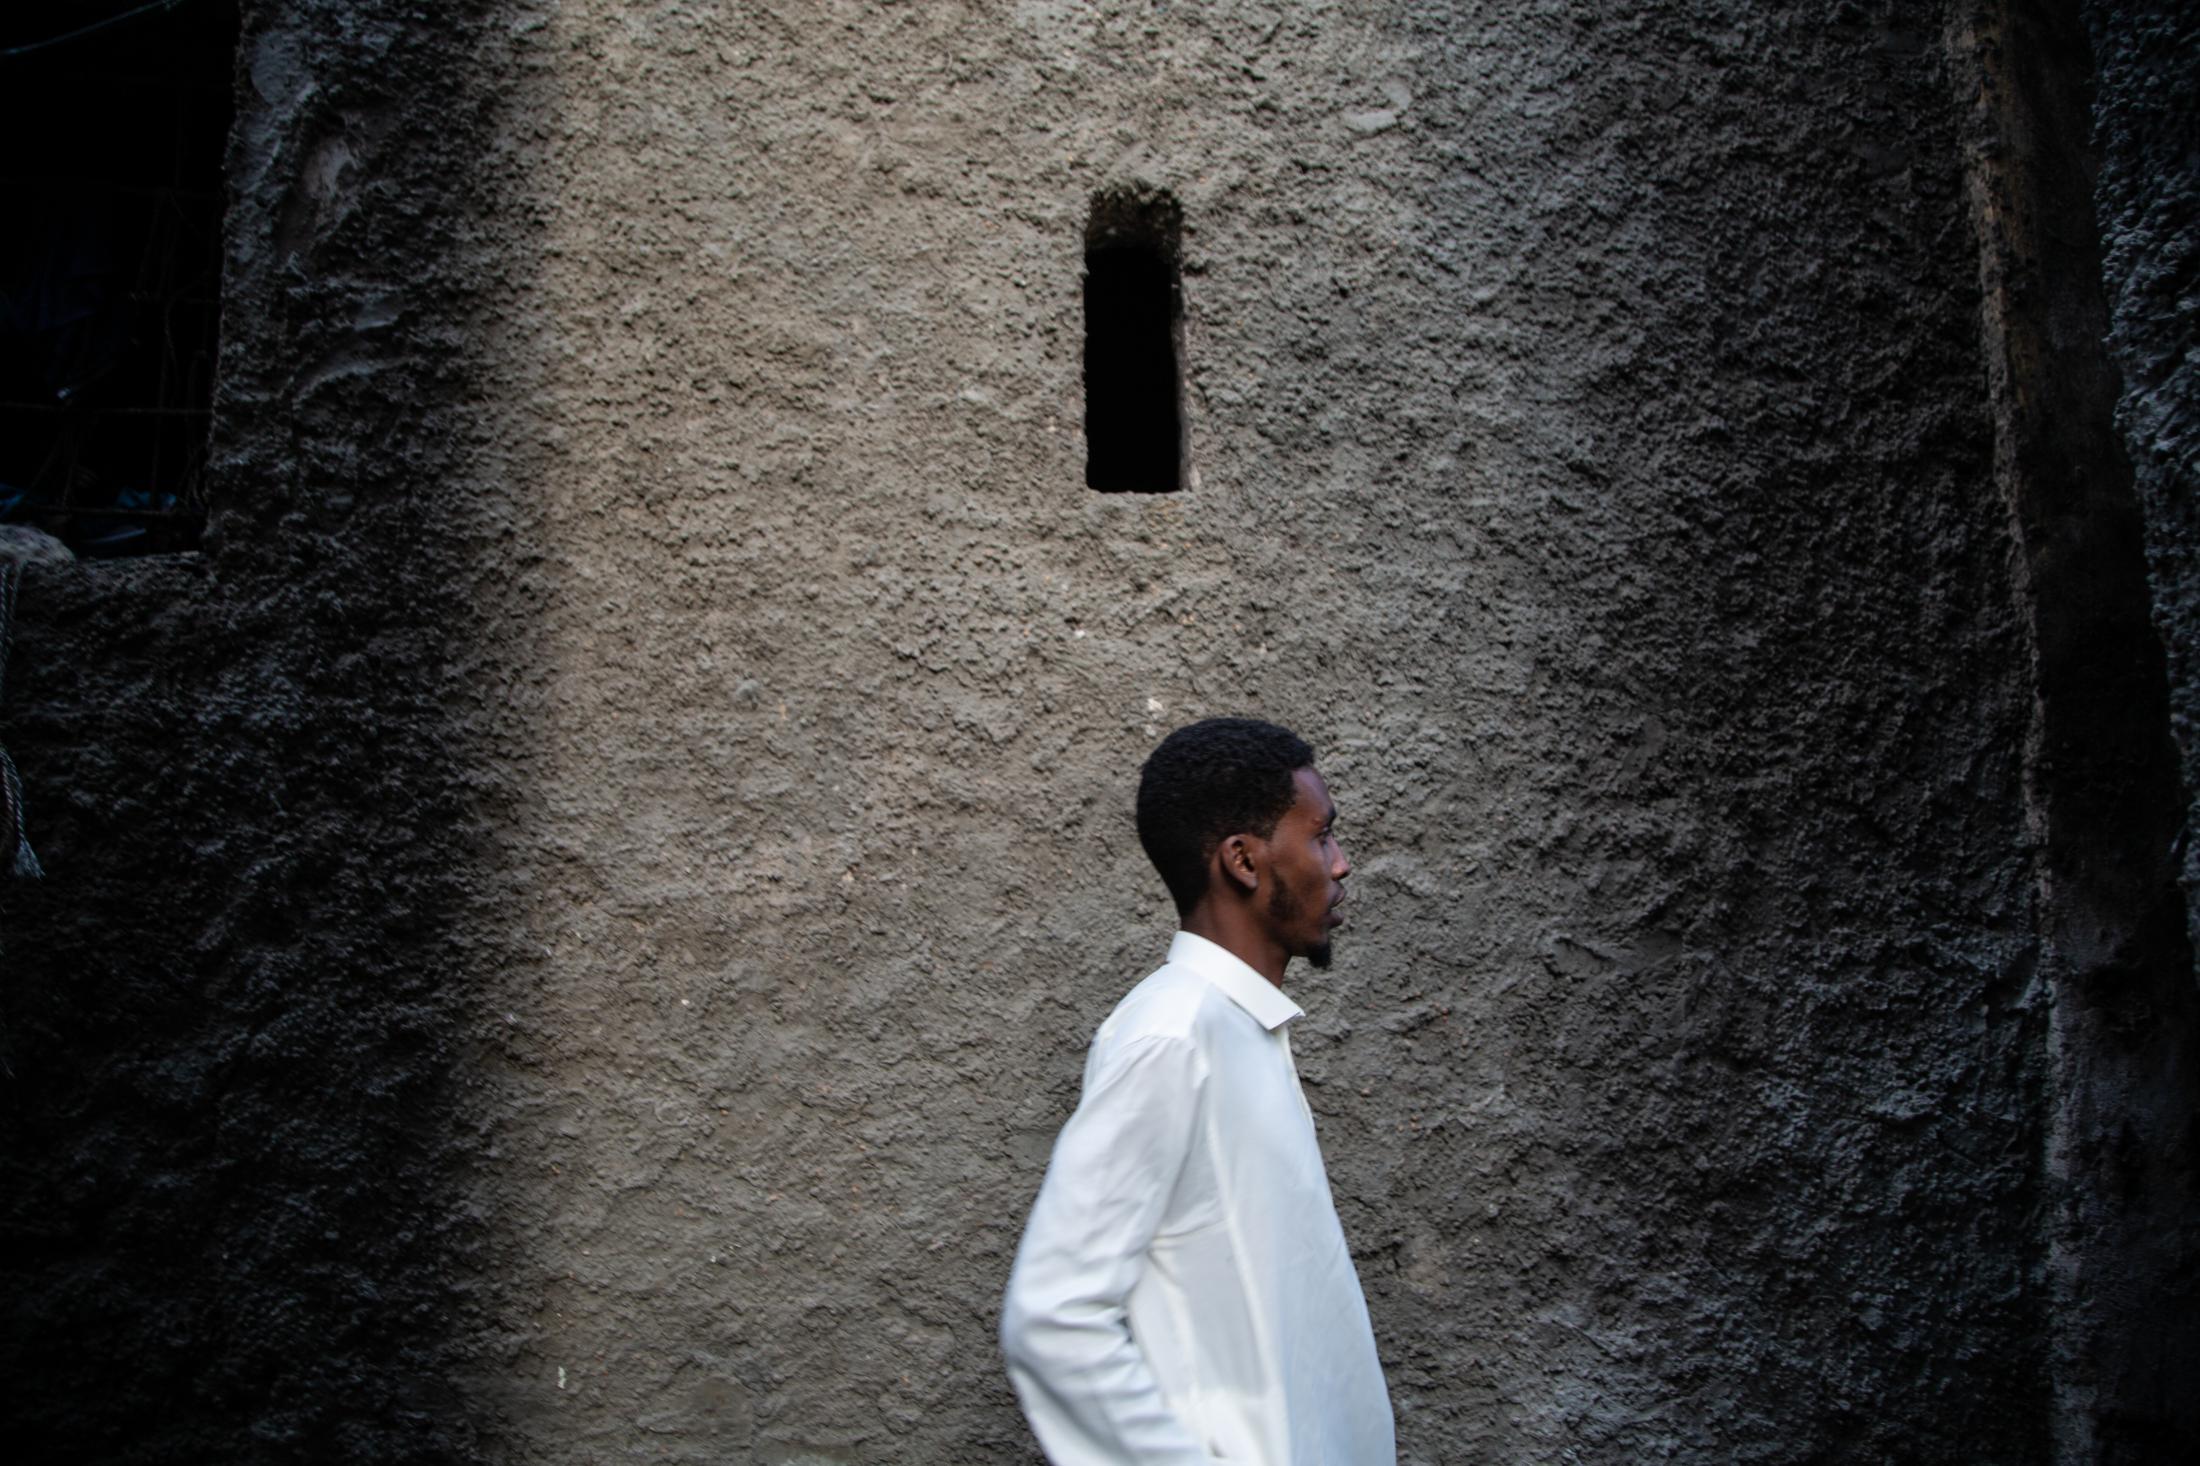 Men in Qamis in Xamar Weyne, Somalia.